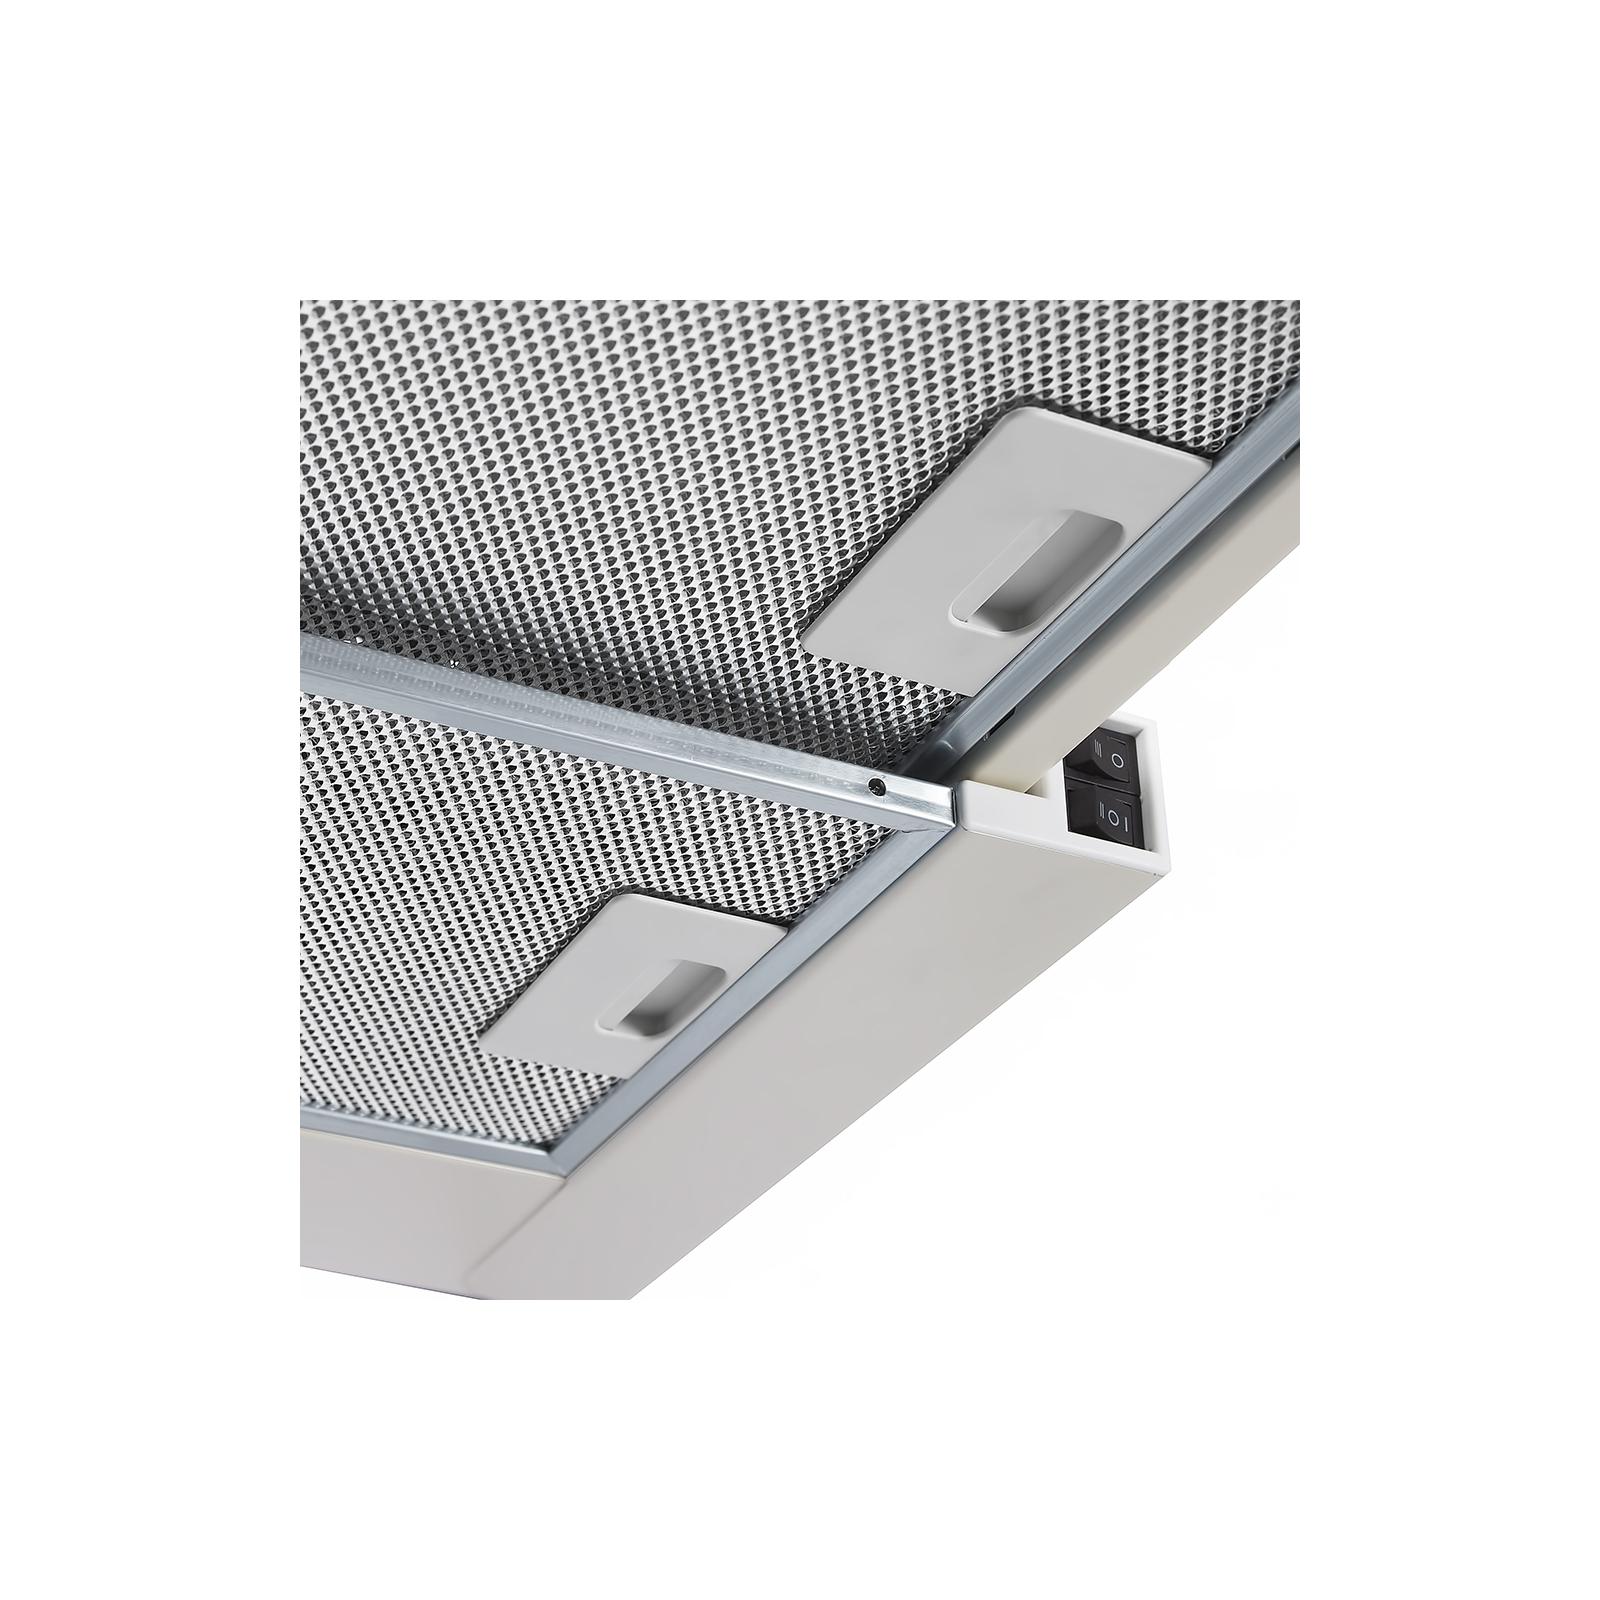 Вытяжка кухонная Perfelli TL 6112 IV LED изображение 4